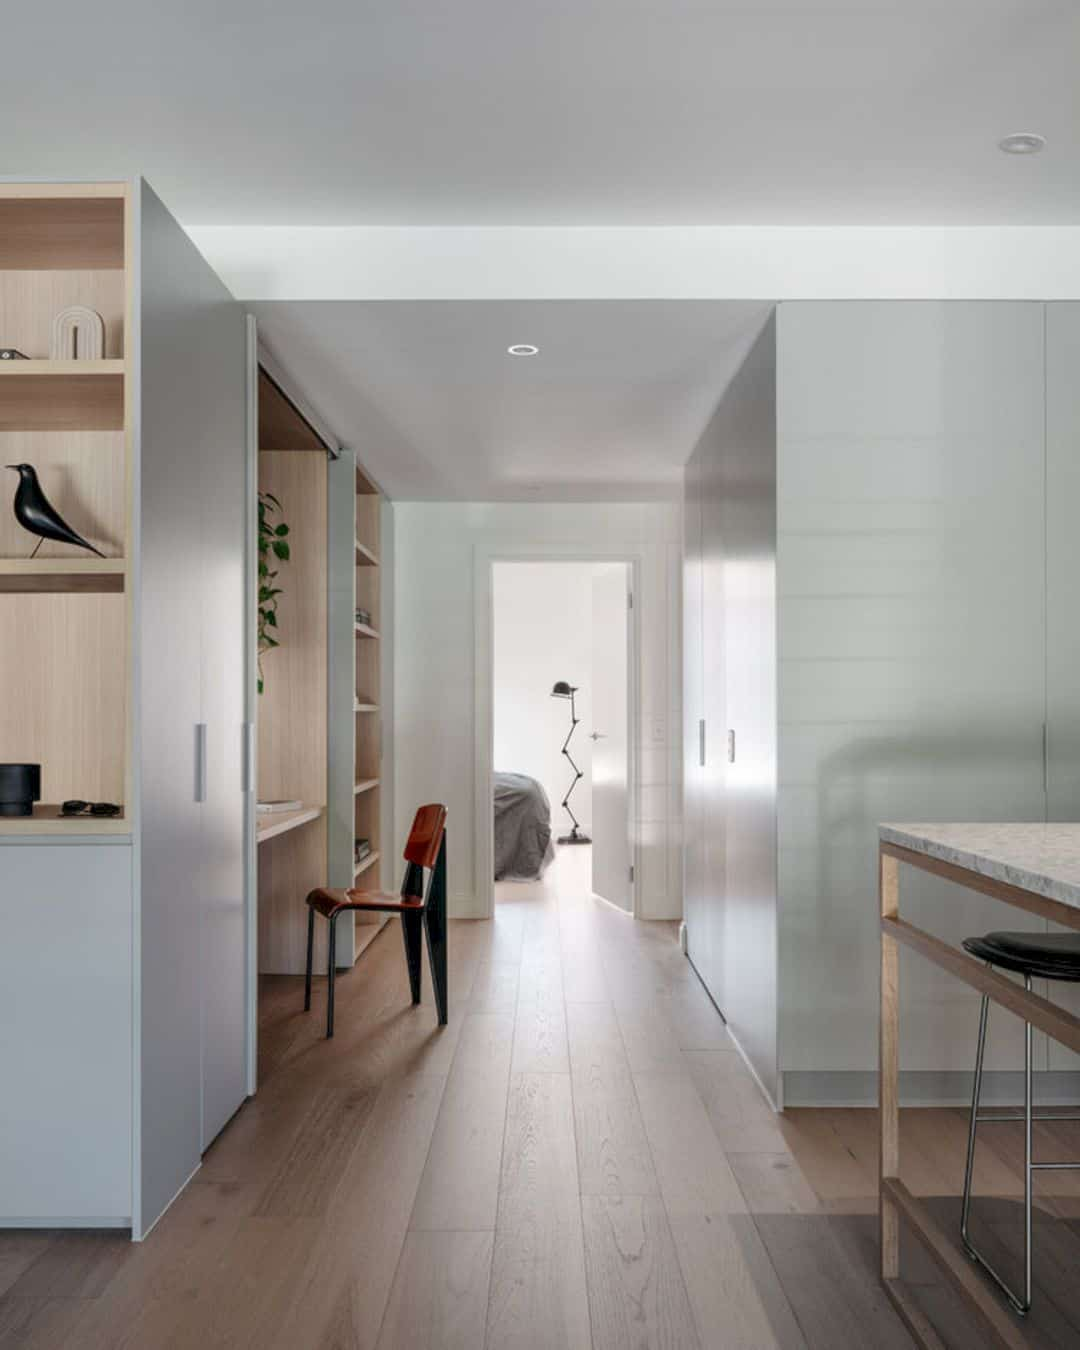 Carlton Apartment By Tom Eckersley Architects 5